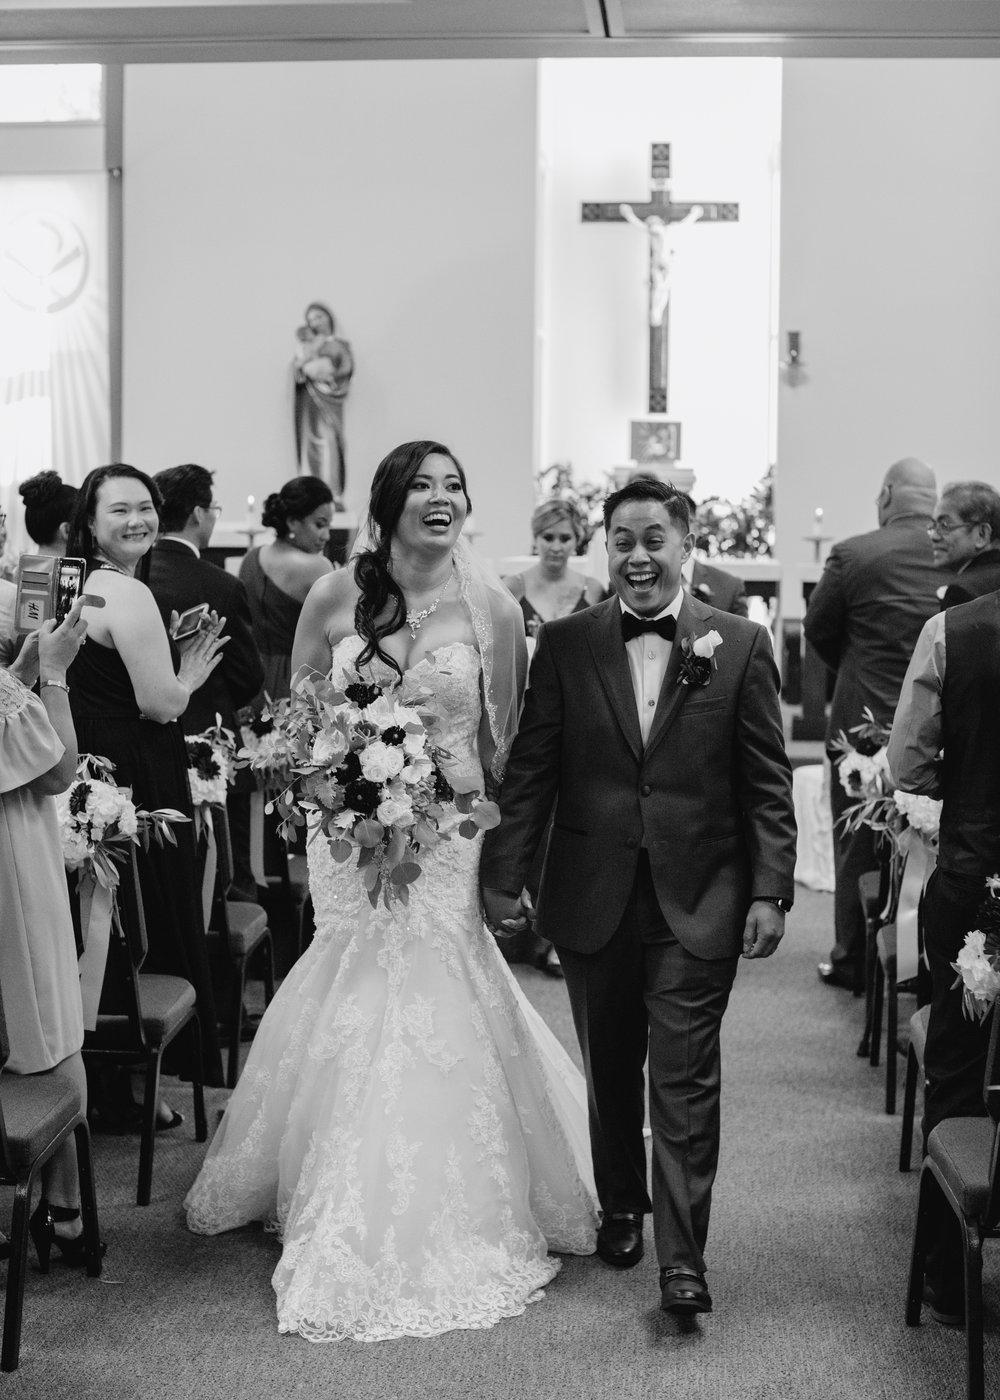 katherine_beth_photography_san_diego_wedding_photographer_the_venue_eastlake_chula_vista_wedding_the_knot_san_diego_003.jpg